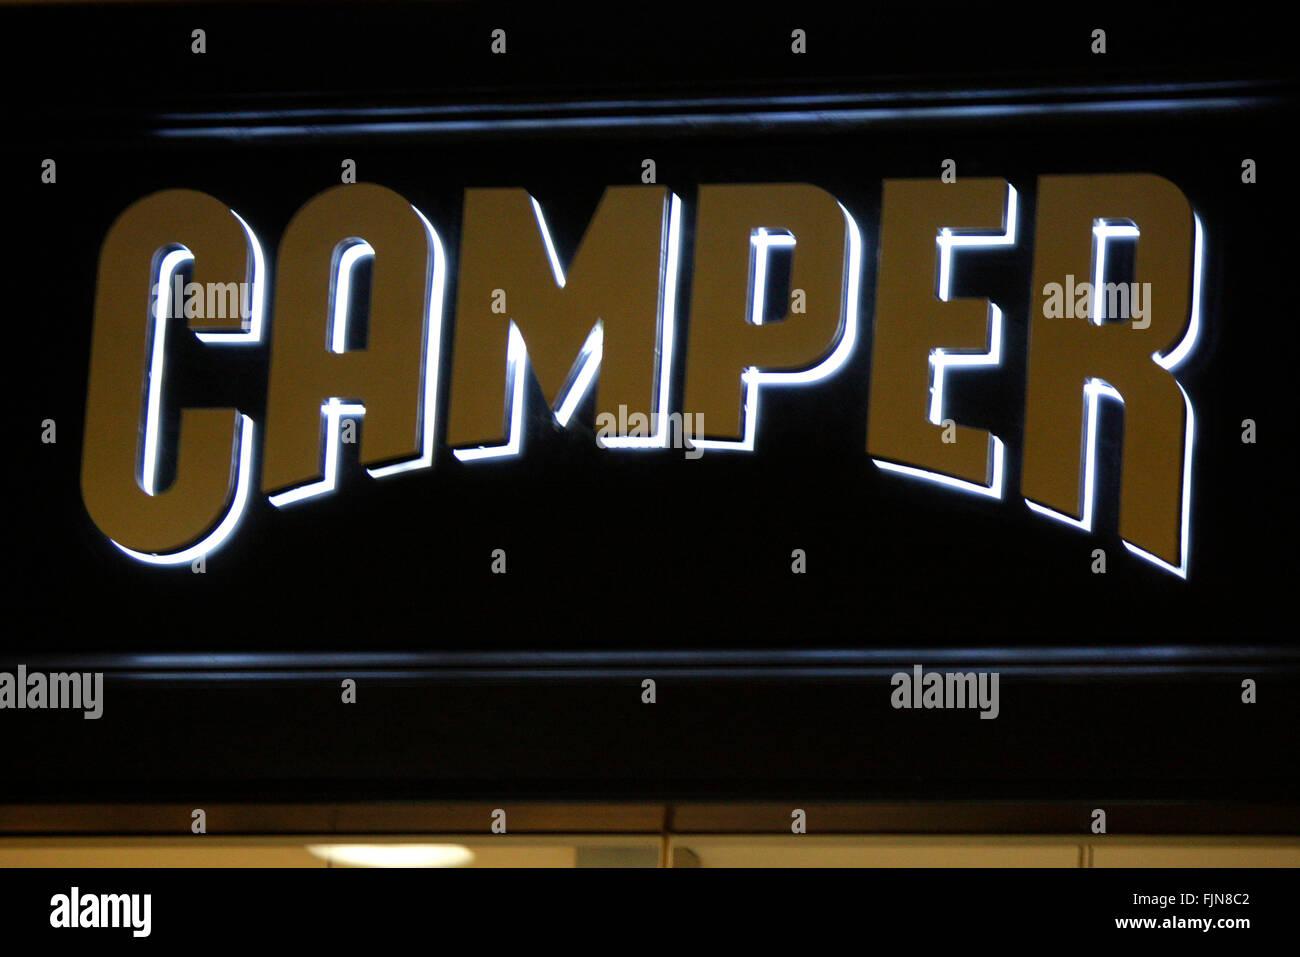 Markenname: 'Camper', Berlin. - Stock Image